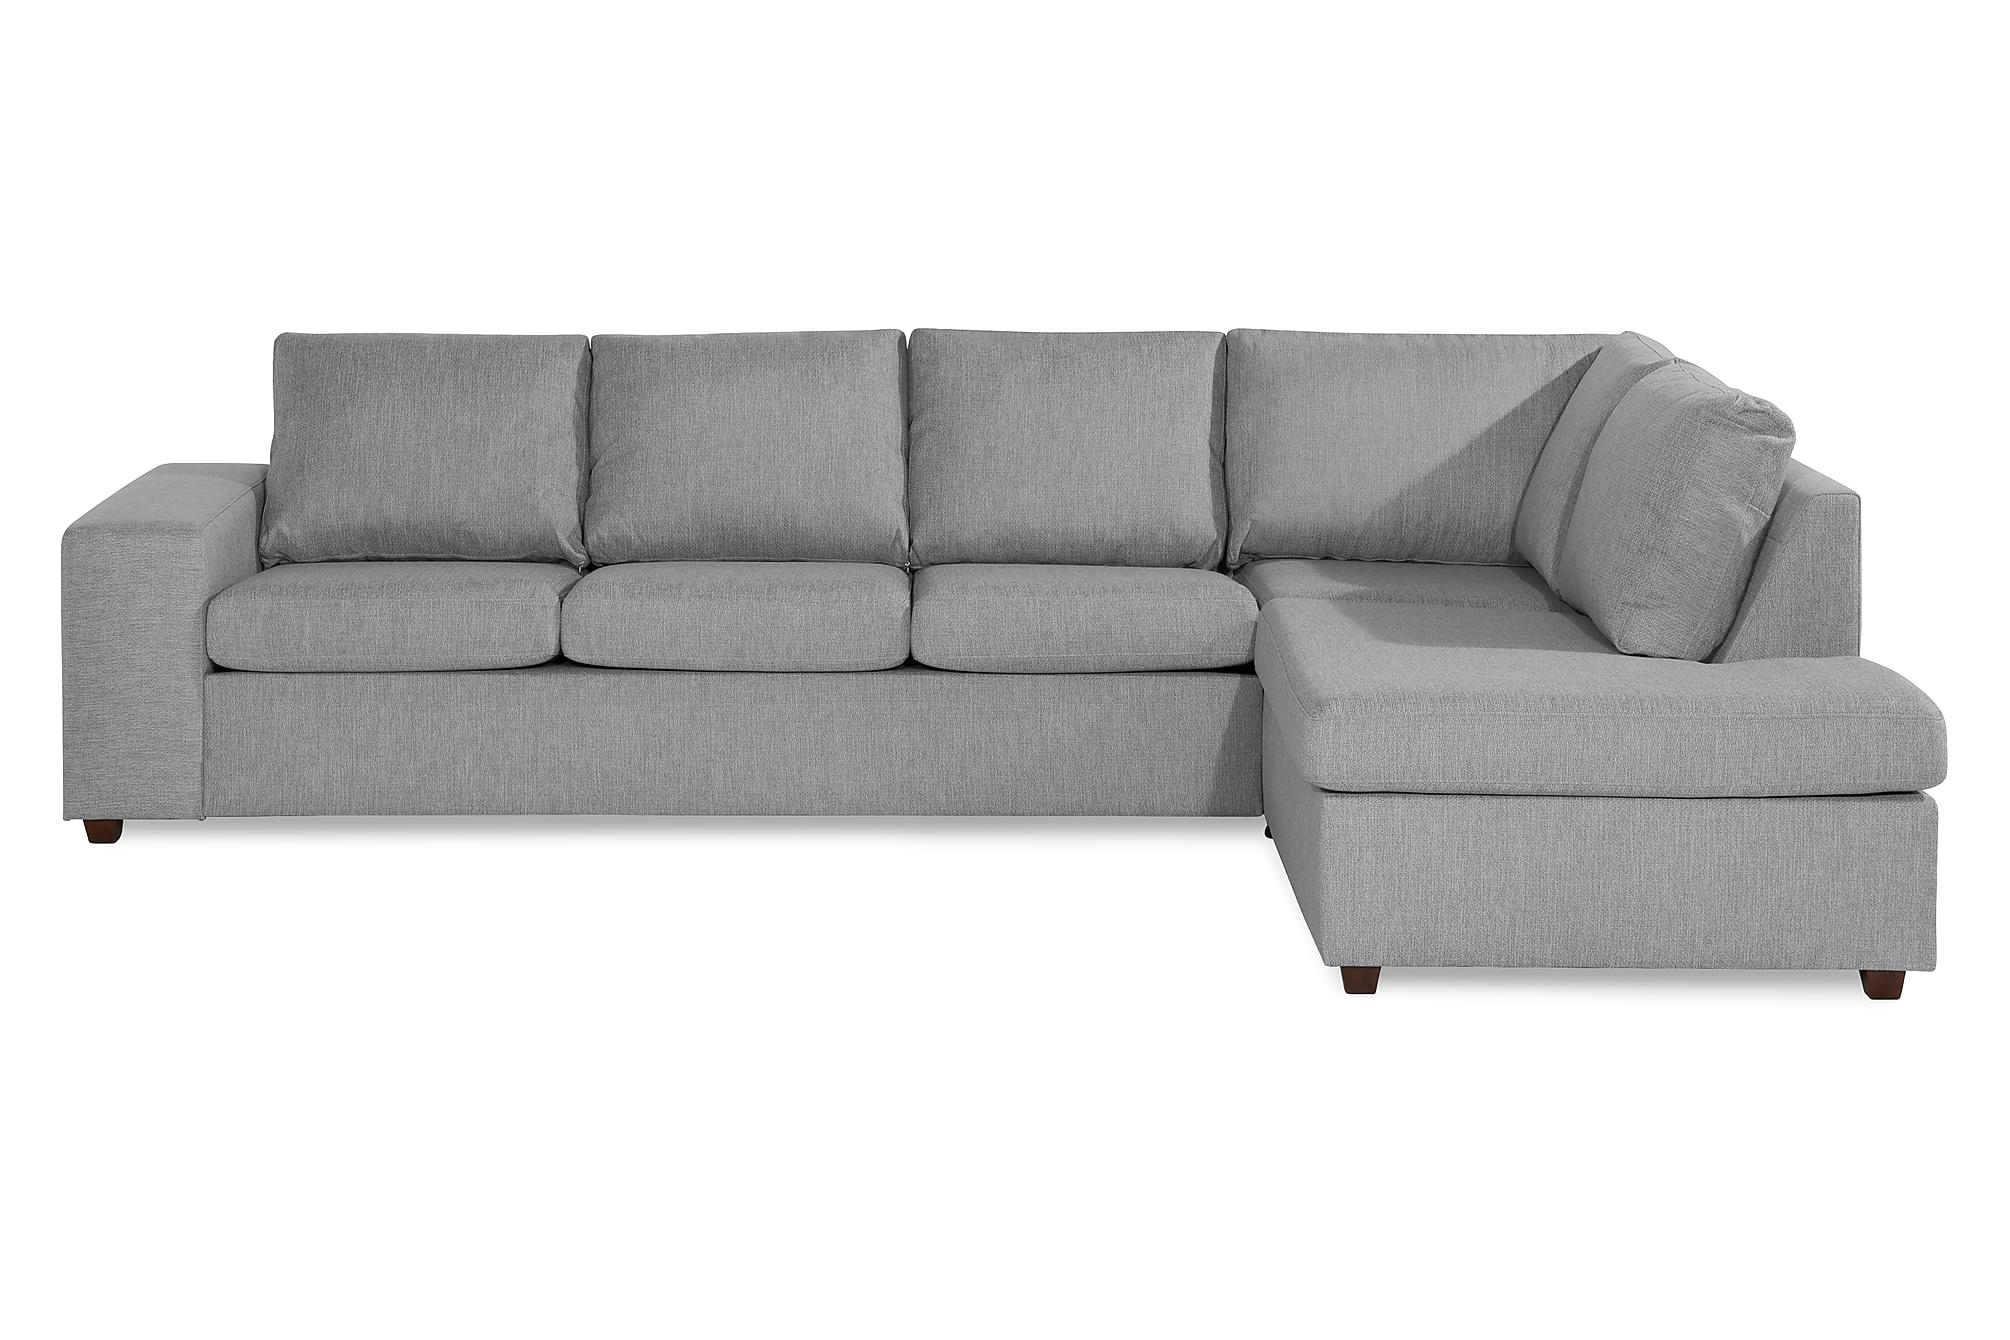 WINDHAM 4-sits Soffa med Schäslong Höger Ljusgrå